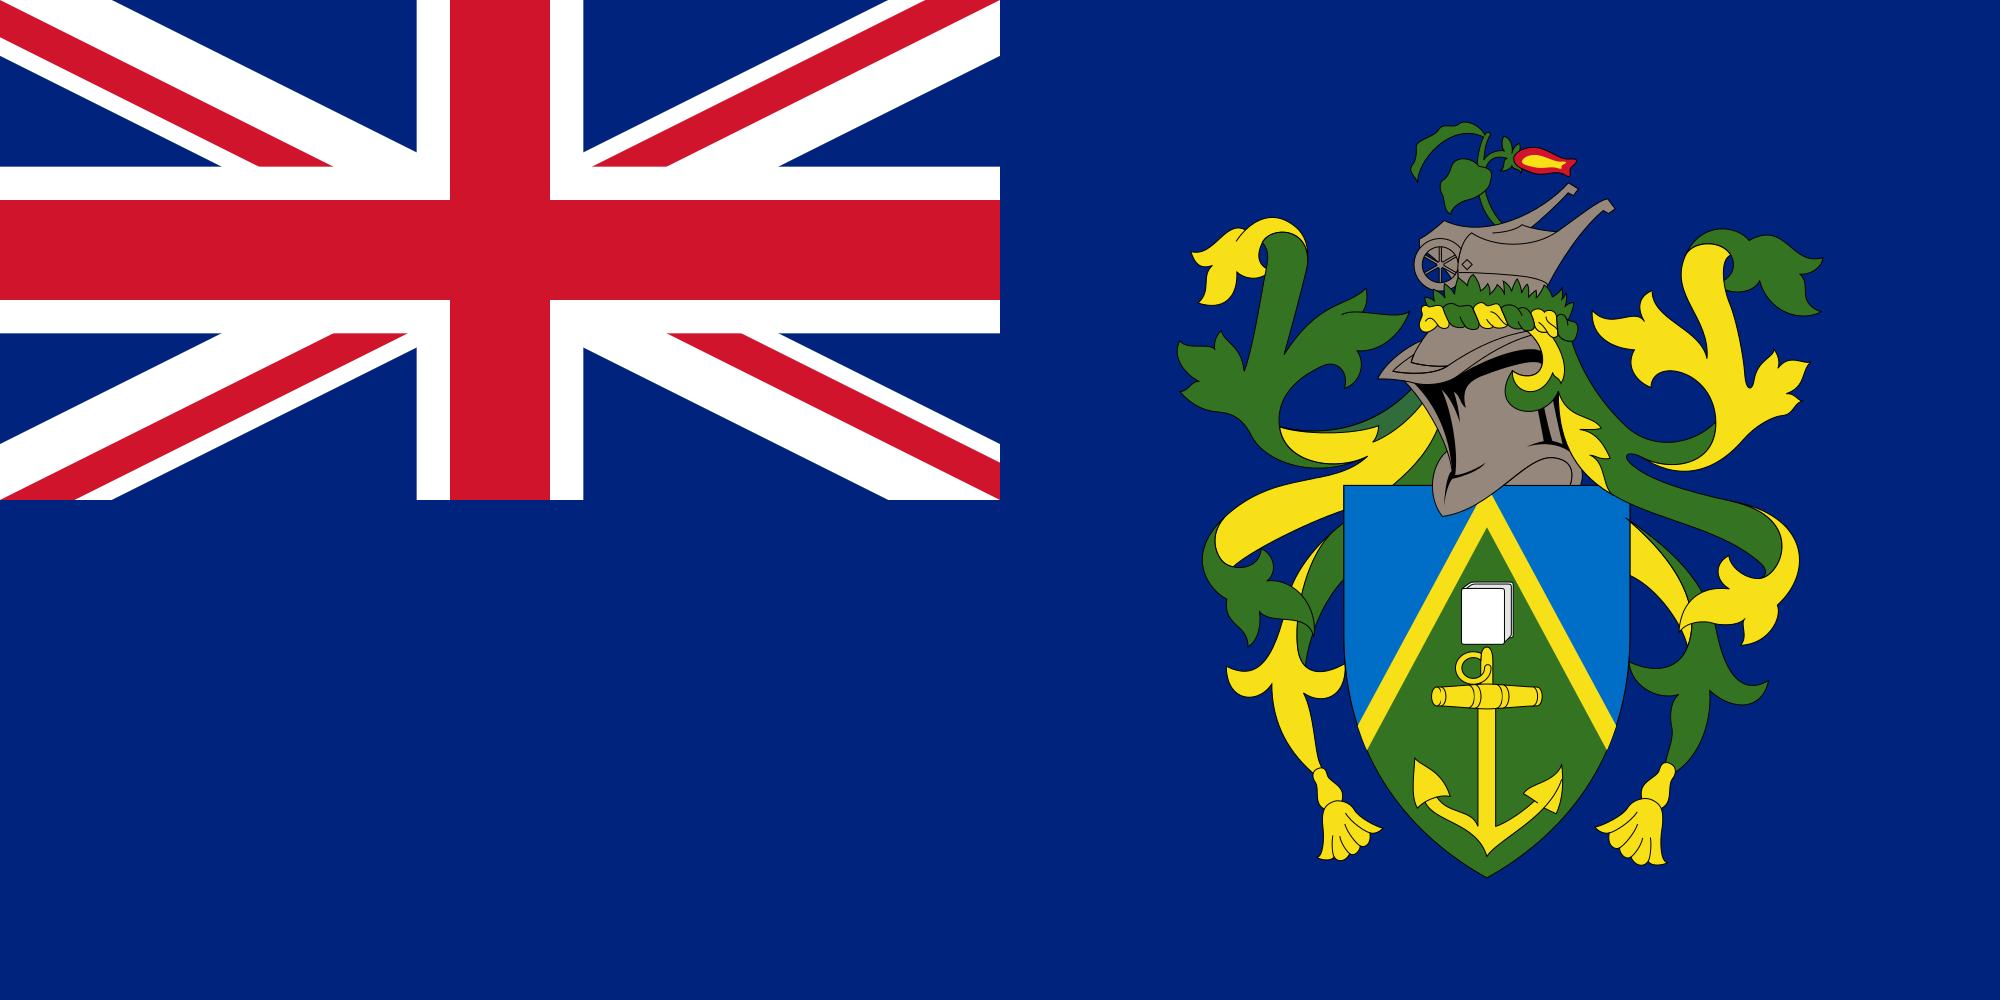 Isole pitcairn, paese, emblema, logo, simbolo - Sfondi HD - Professor-falken.com